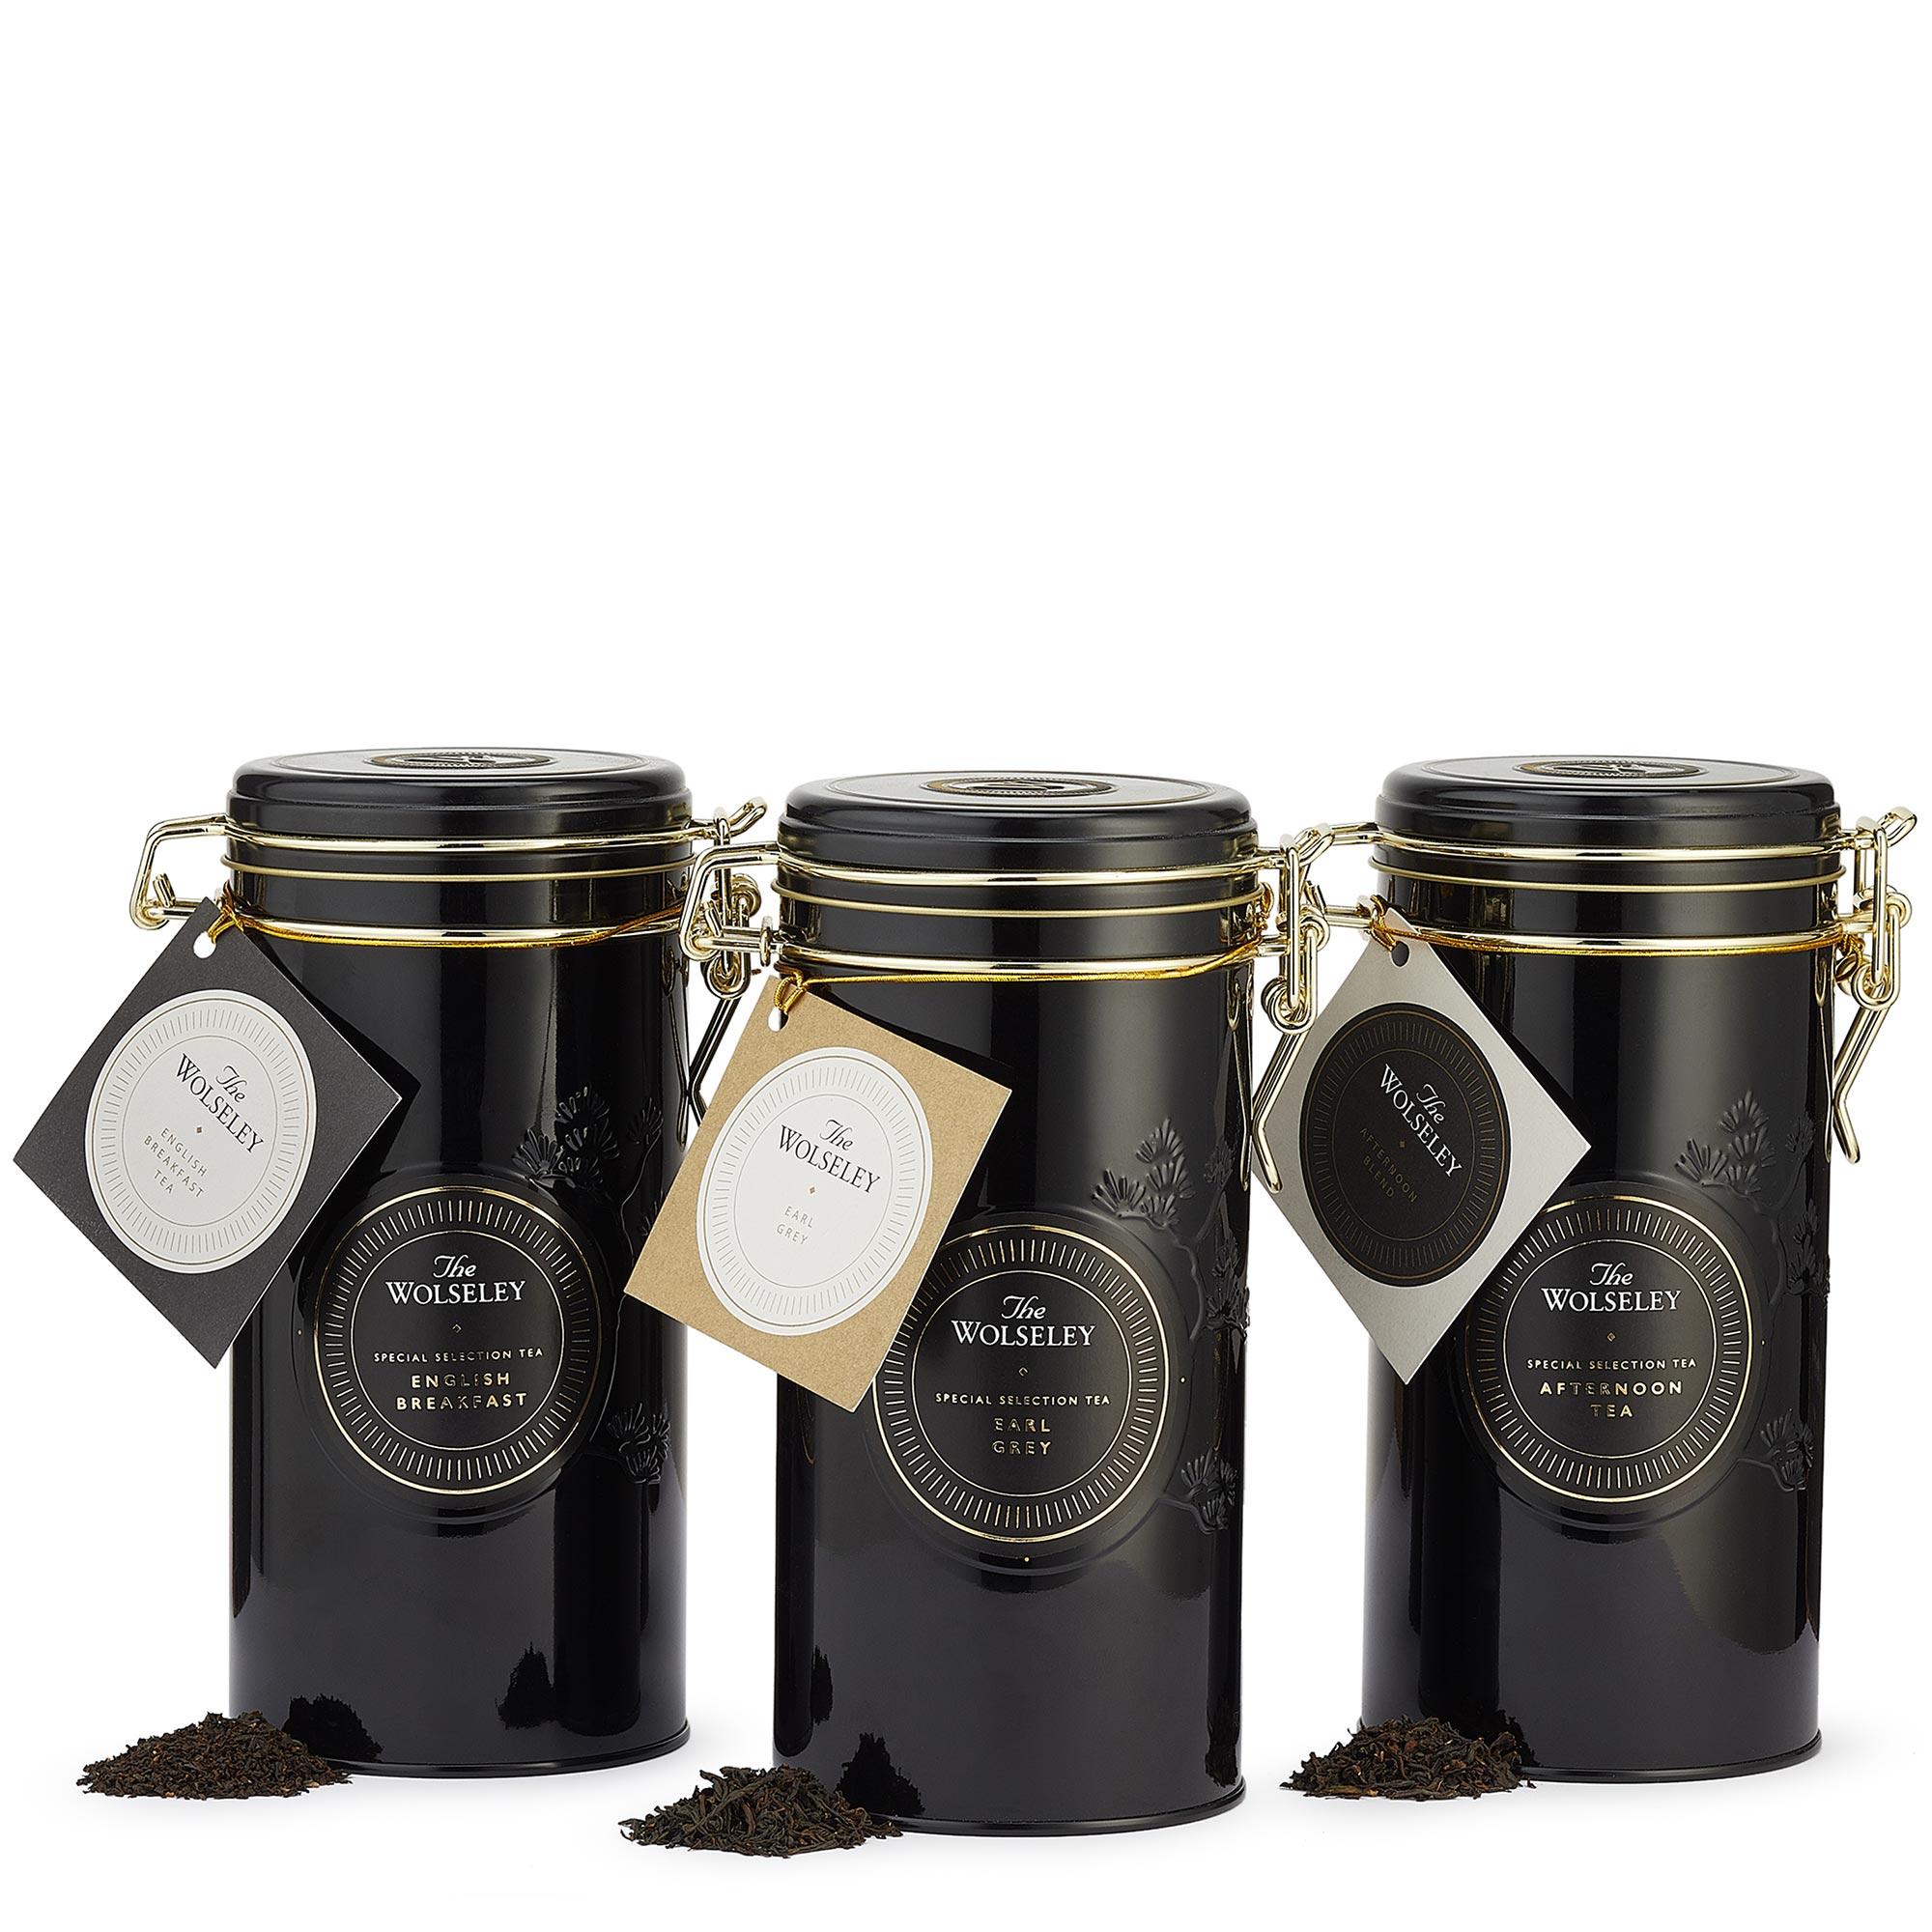 Loose Leaf Tea Gift Set Gifts Hampers The Wolseley